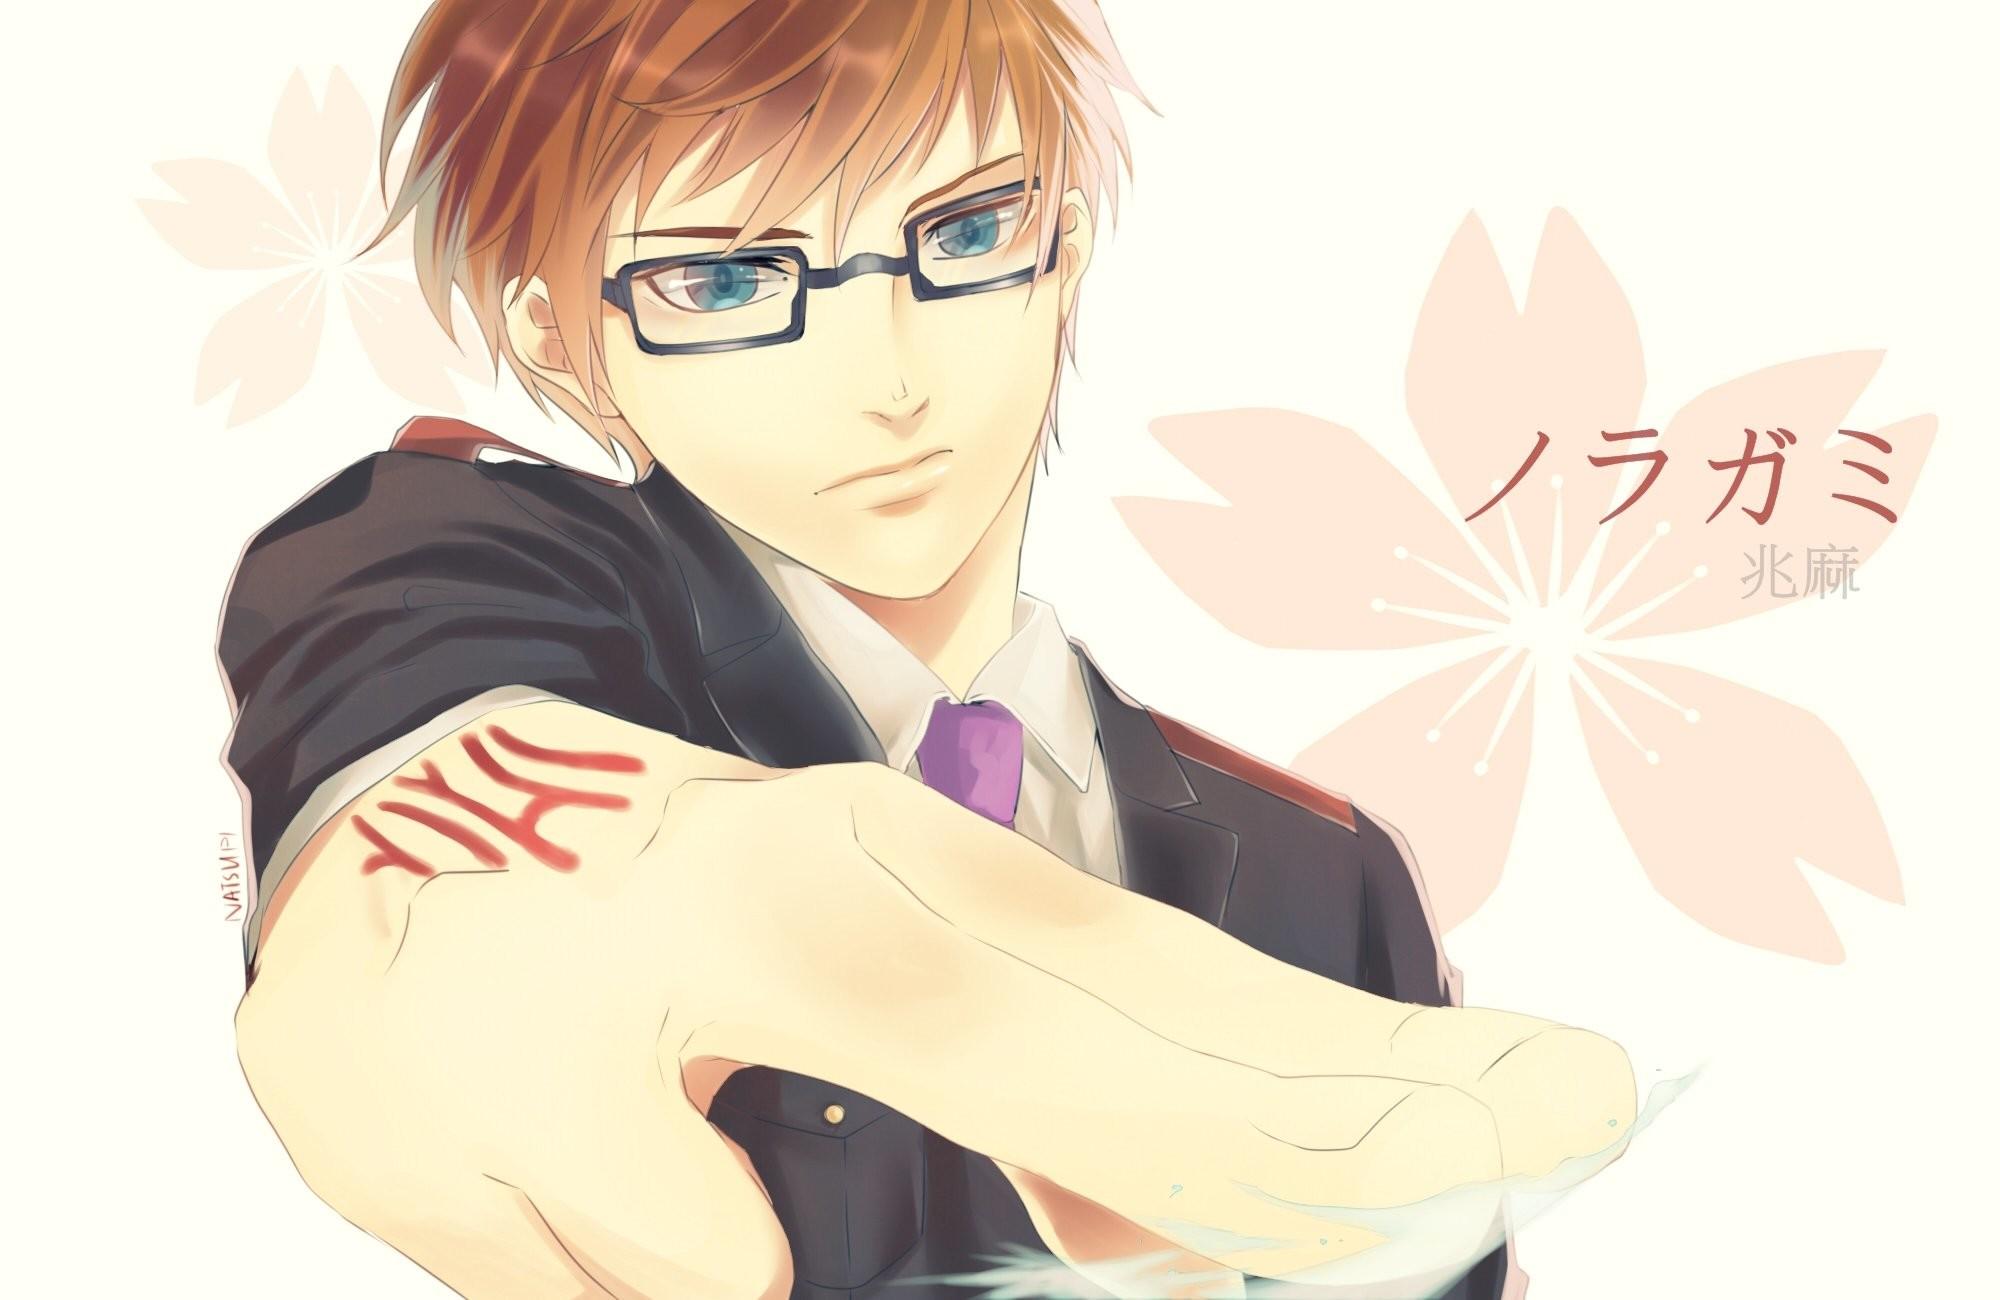 Noragami Kazuma wallpaper background